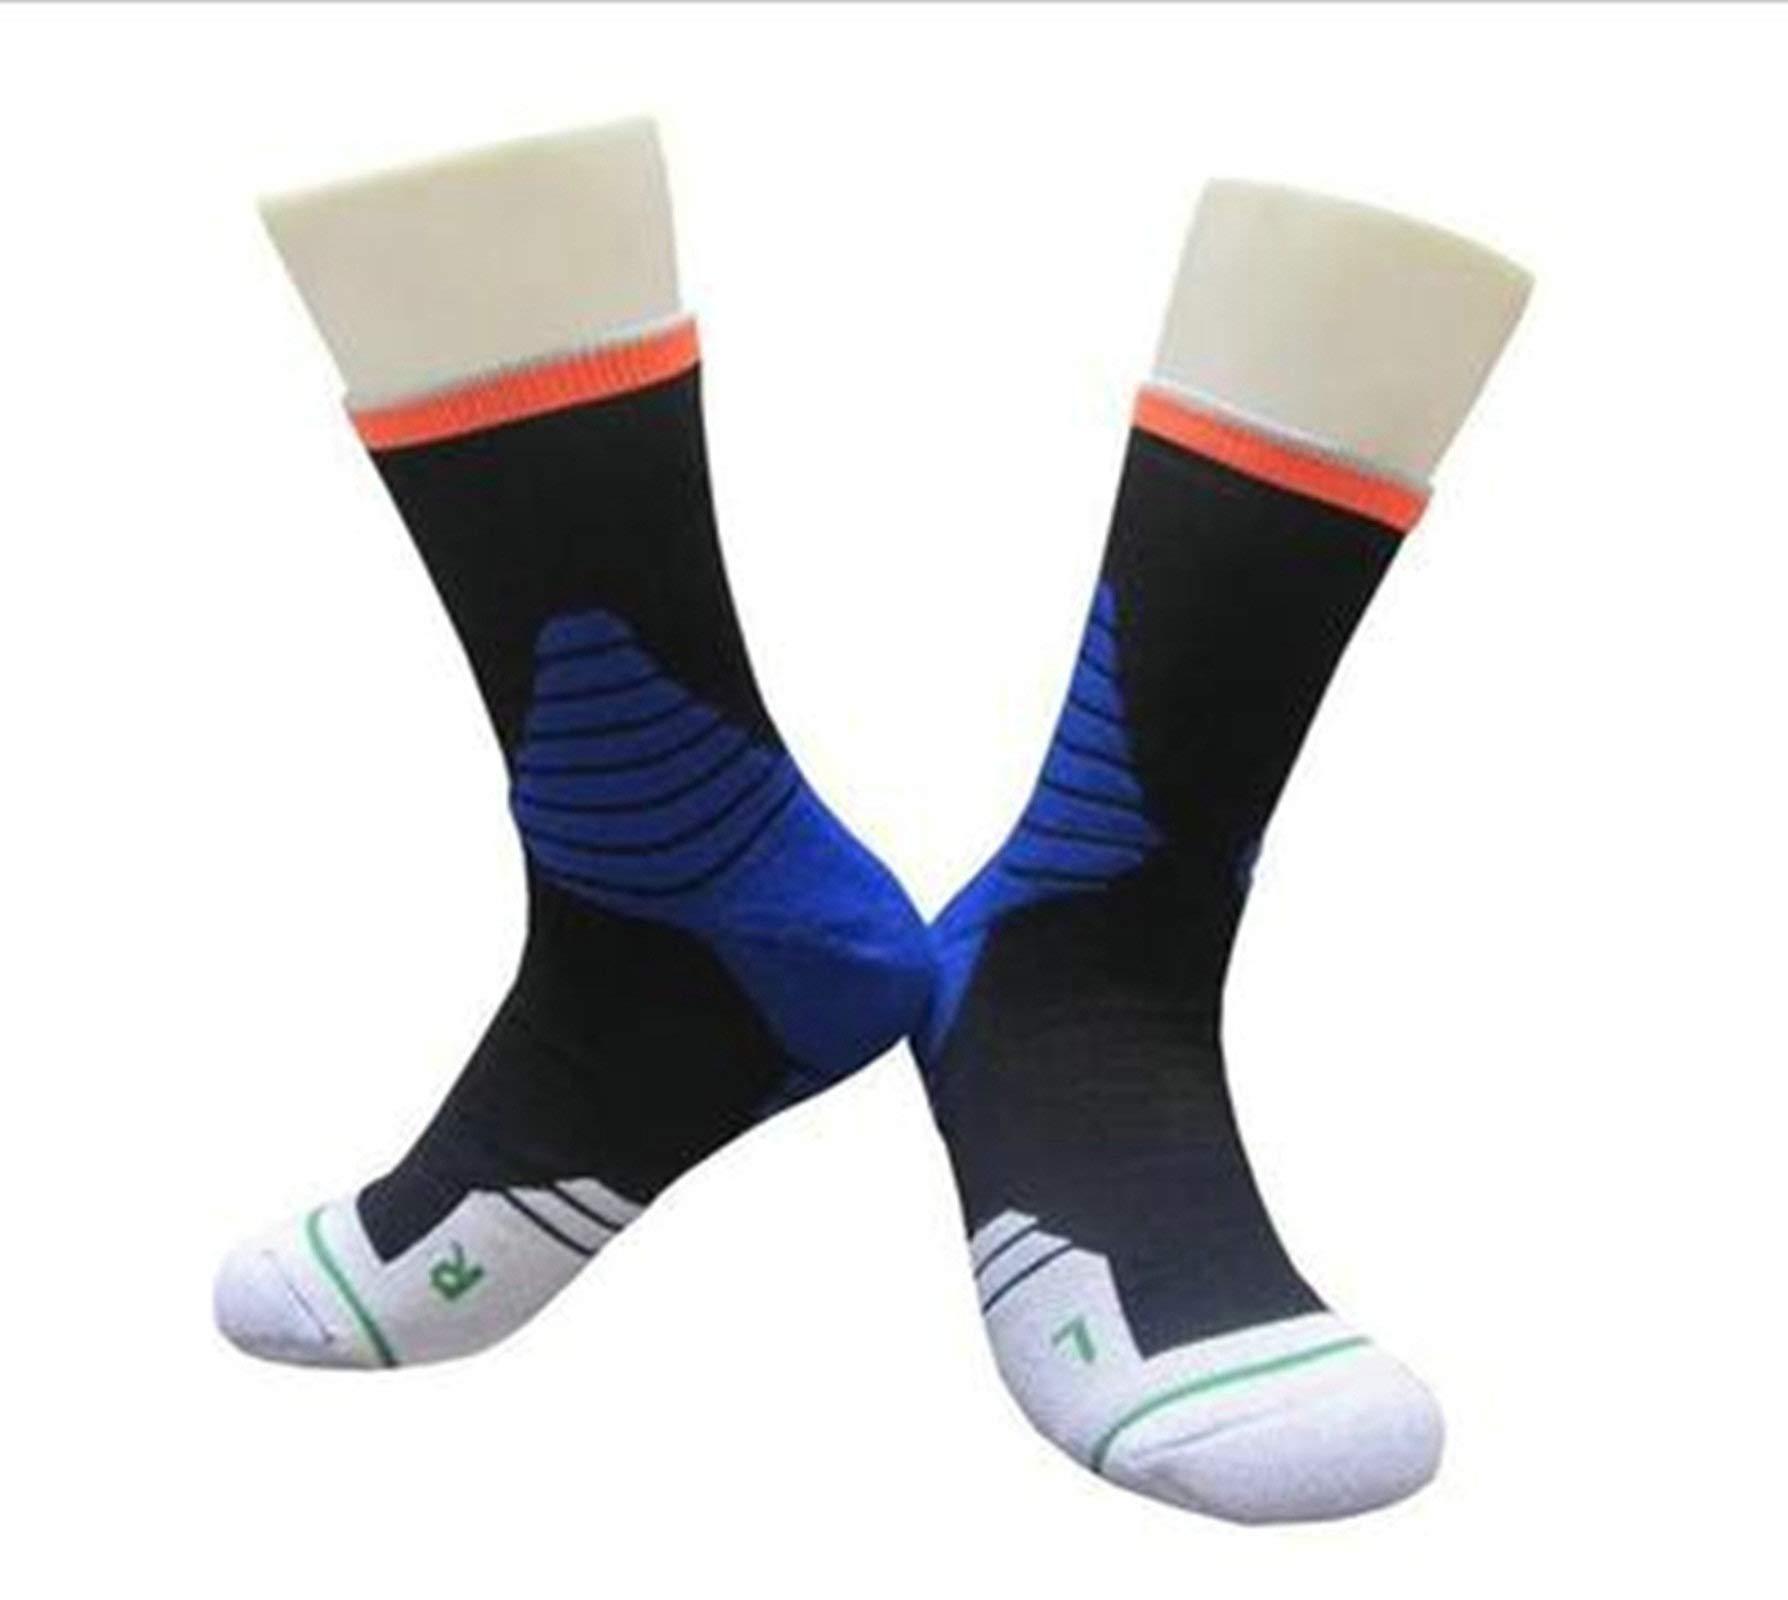 Aooaz Winter Warm Socks 3 Pairs Basketball Socks Thicken High Tube Sports Socks Run Climbing Colorful M